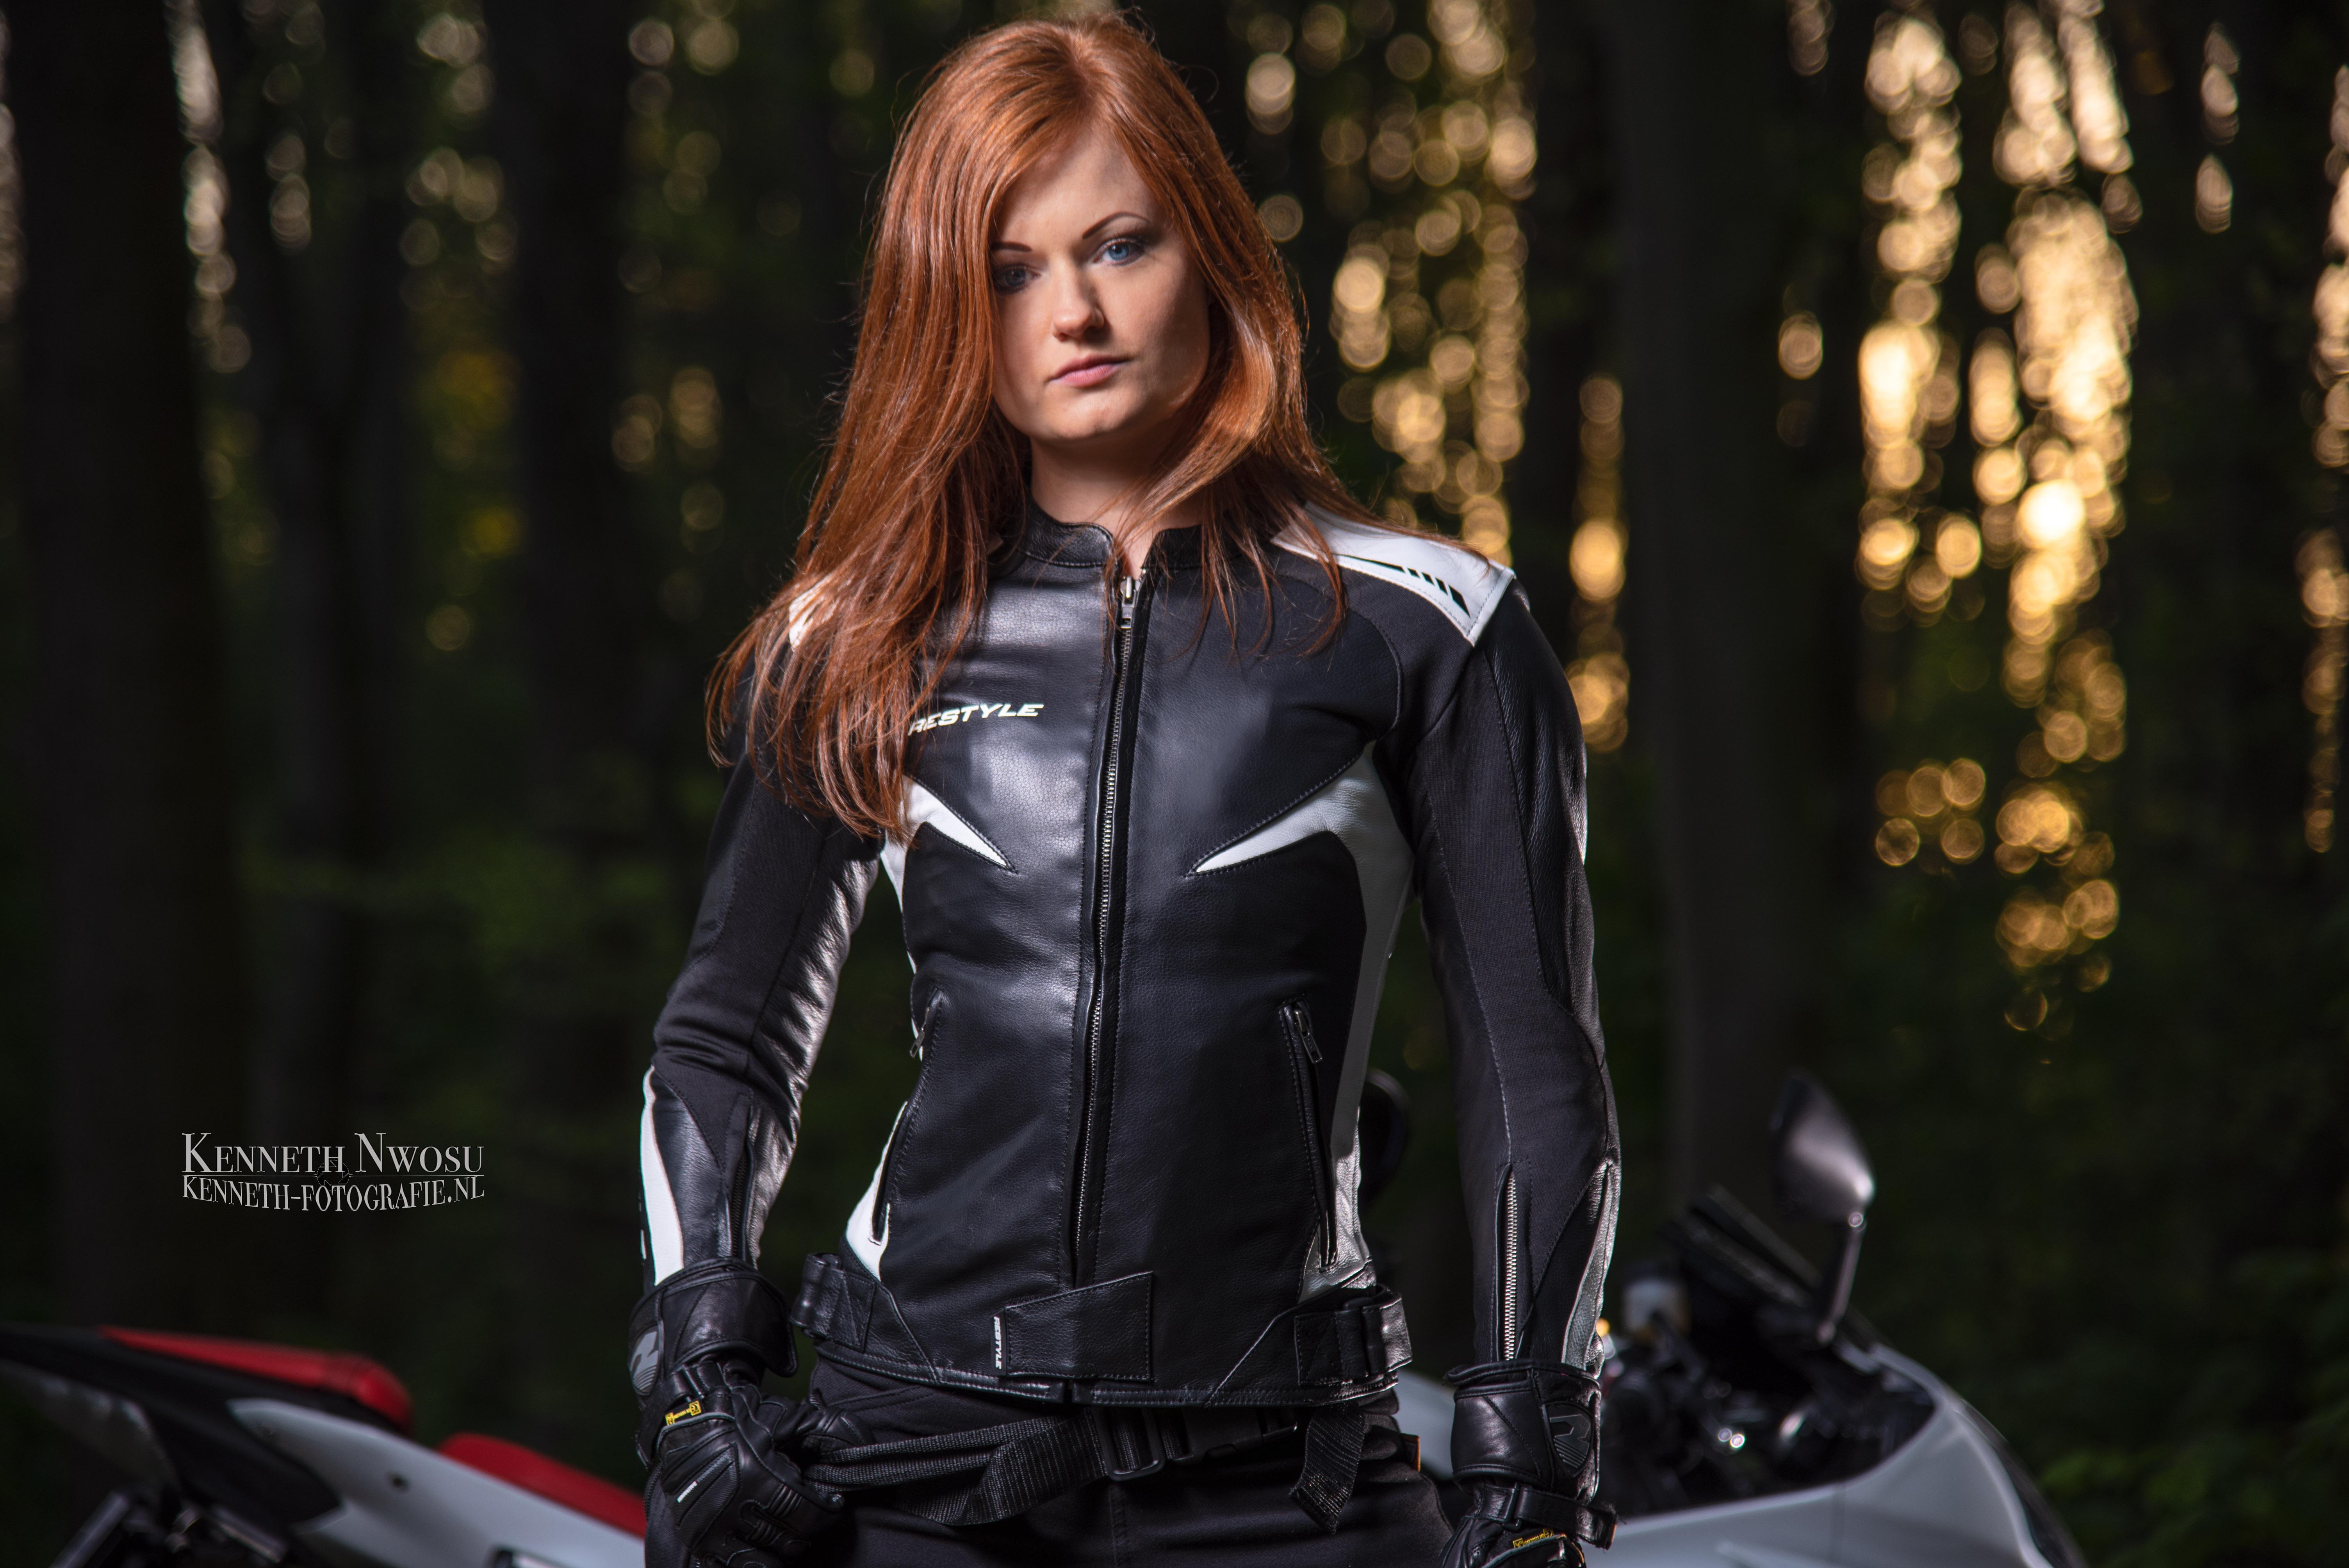 Motorkleding fotoshoot voor Restyle Wear